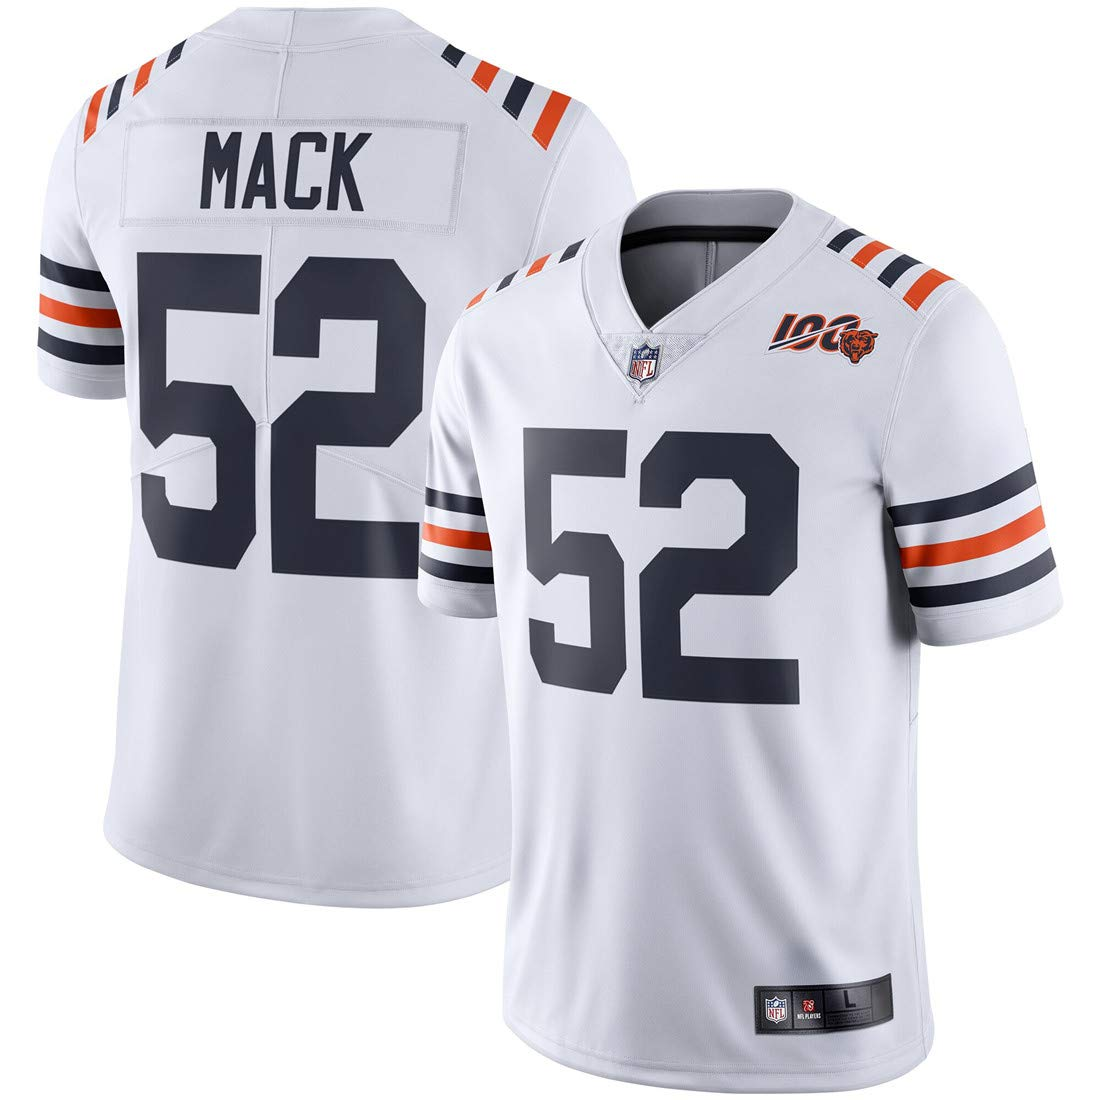 Outerstuff Youth Kids 52 Khalil Mack Chicago Bears 100th Season Jersey